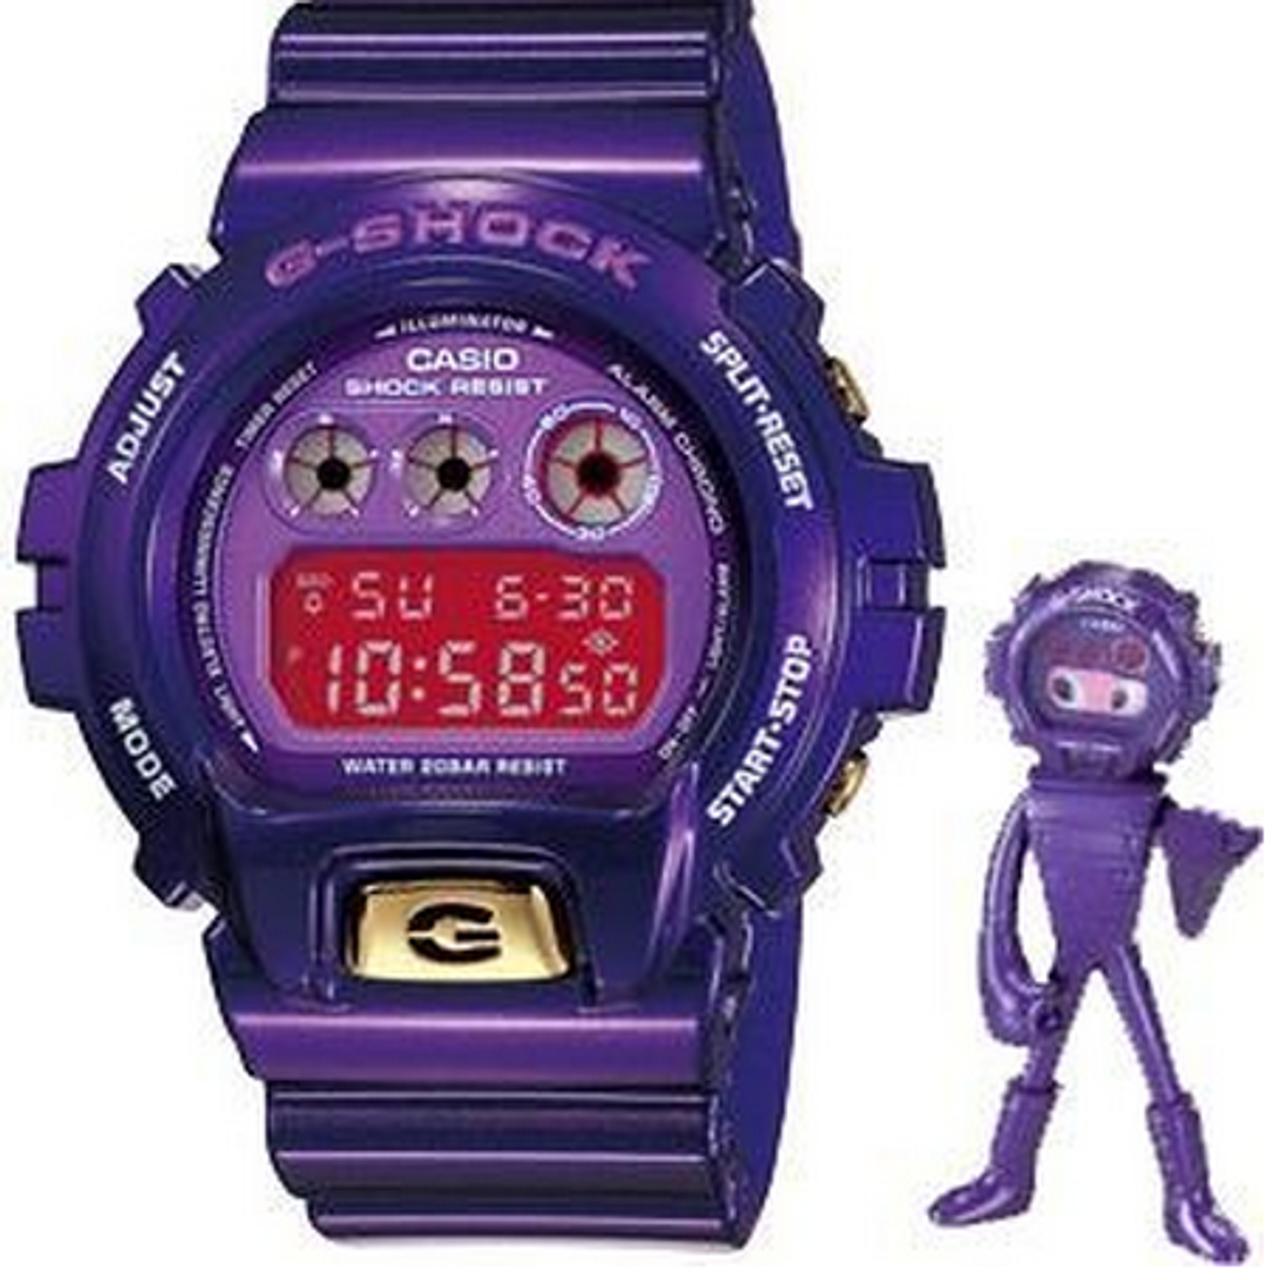 Casio G-Shock Man Box DW-6900SW-6JR Purple Limited